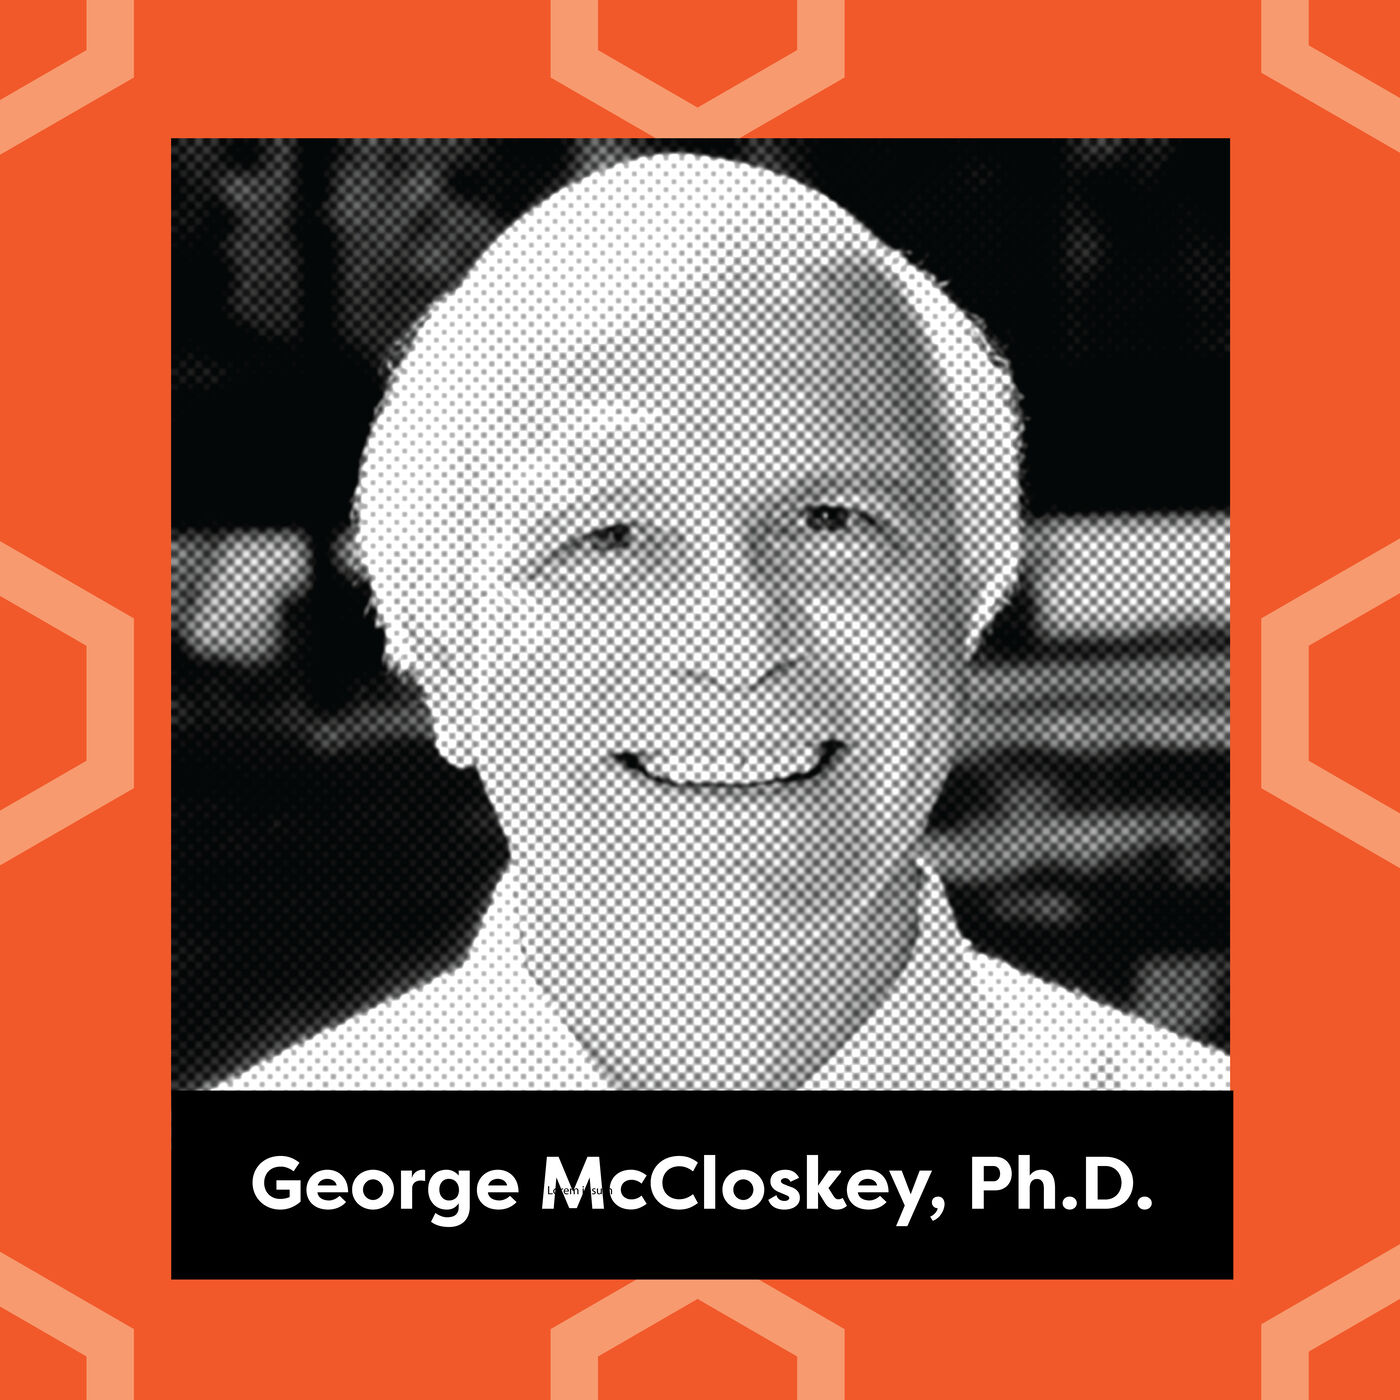 Ep. 132: George McCloskey, Ph.D. - Evolution of System 2